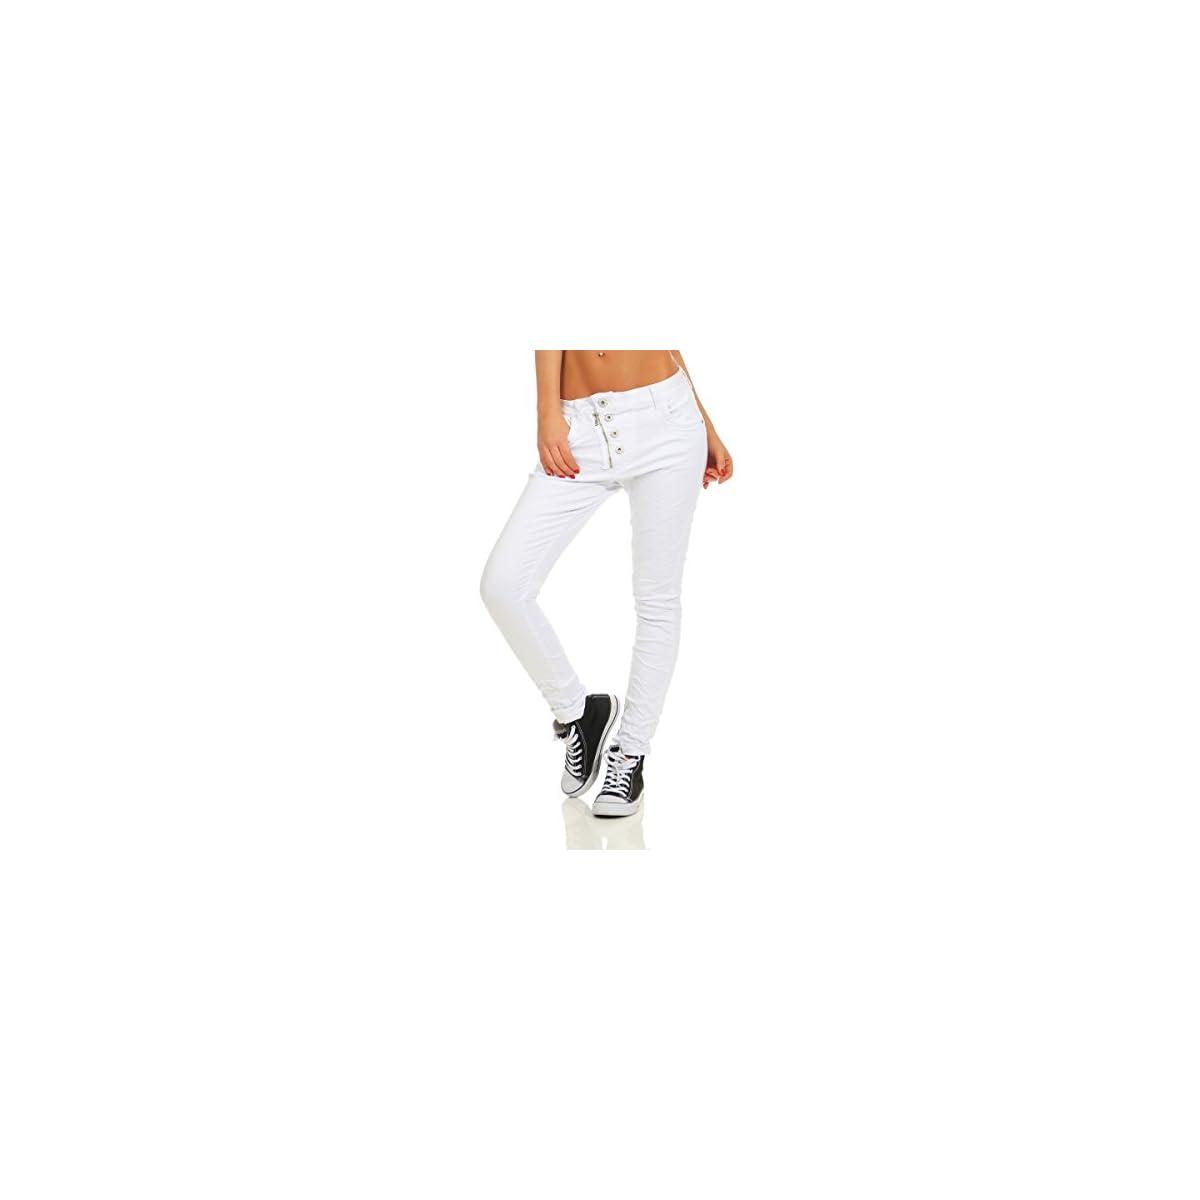 Fashion4Young 11105 Damen Jeans Hose Boyfriend weiß